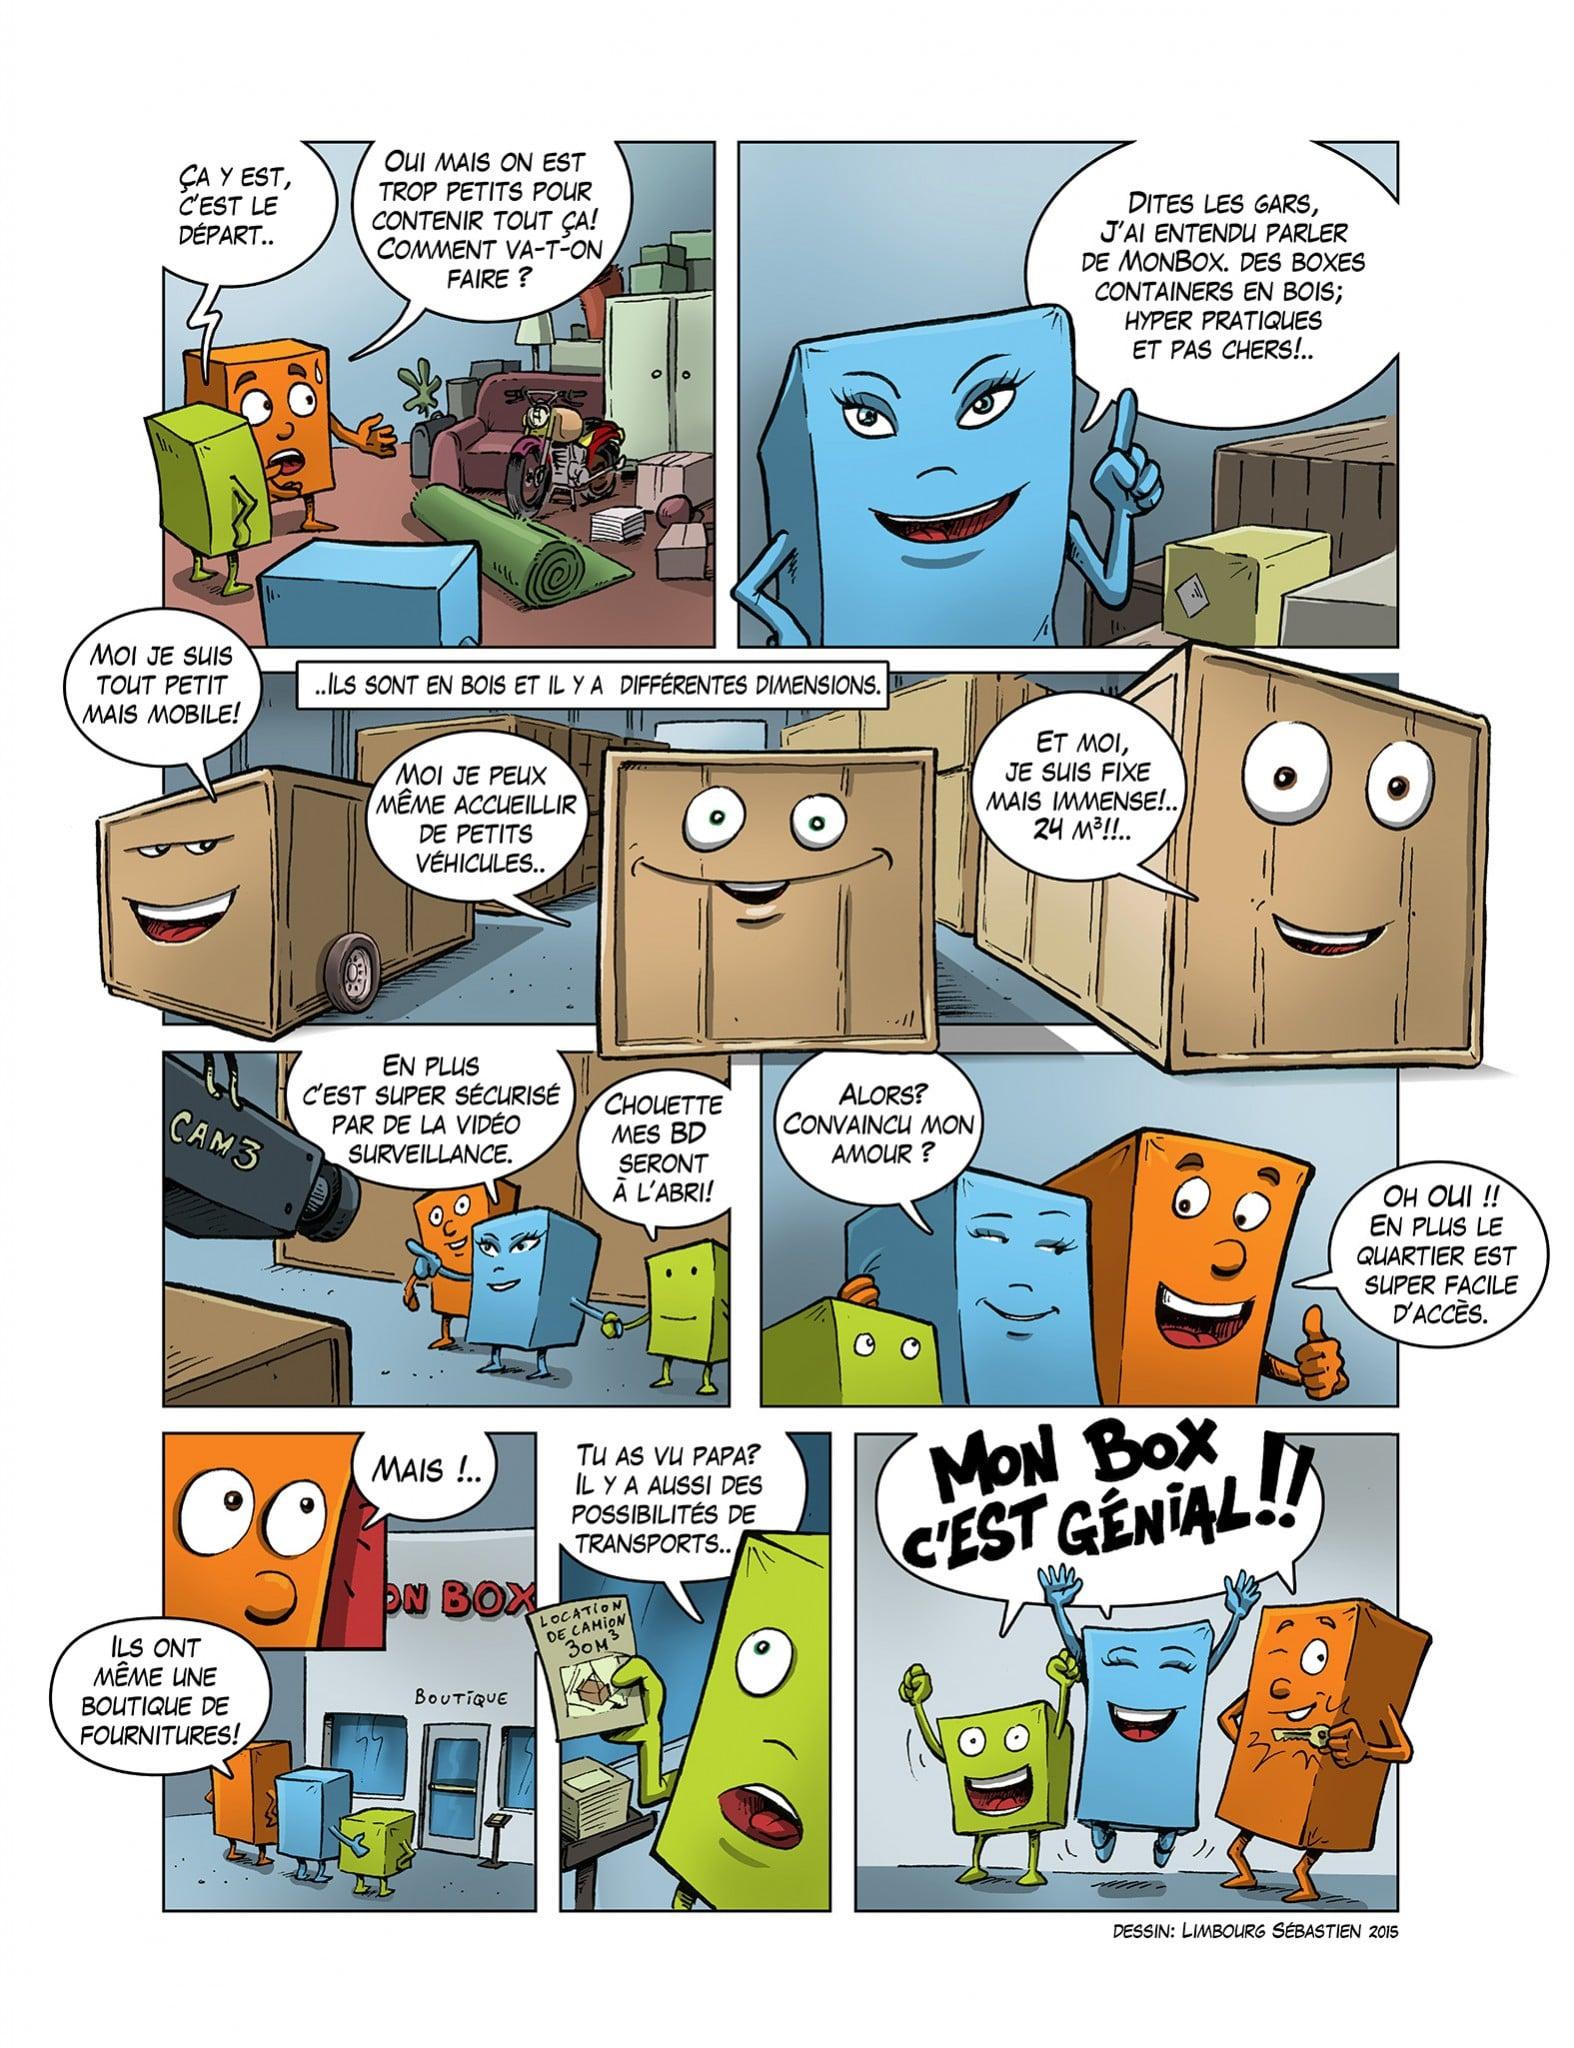 http://www.monbox.be/wp-content/uploads/2015/10/faq-box-stockage-garde-meuble-sambreville-namur.jpg